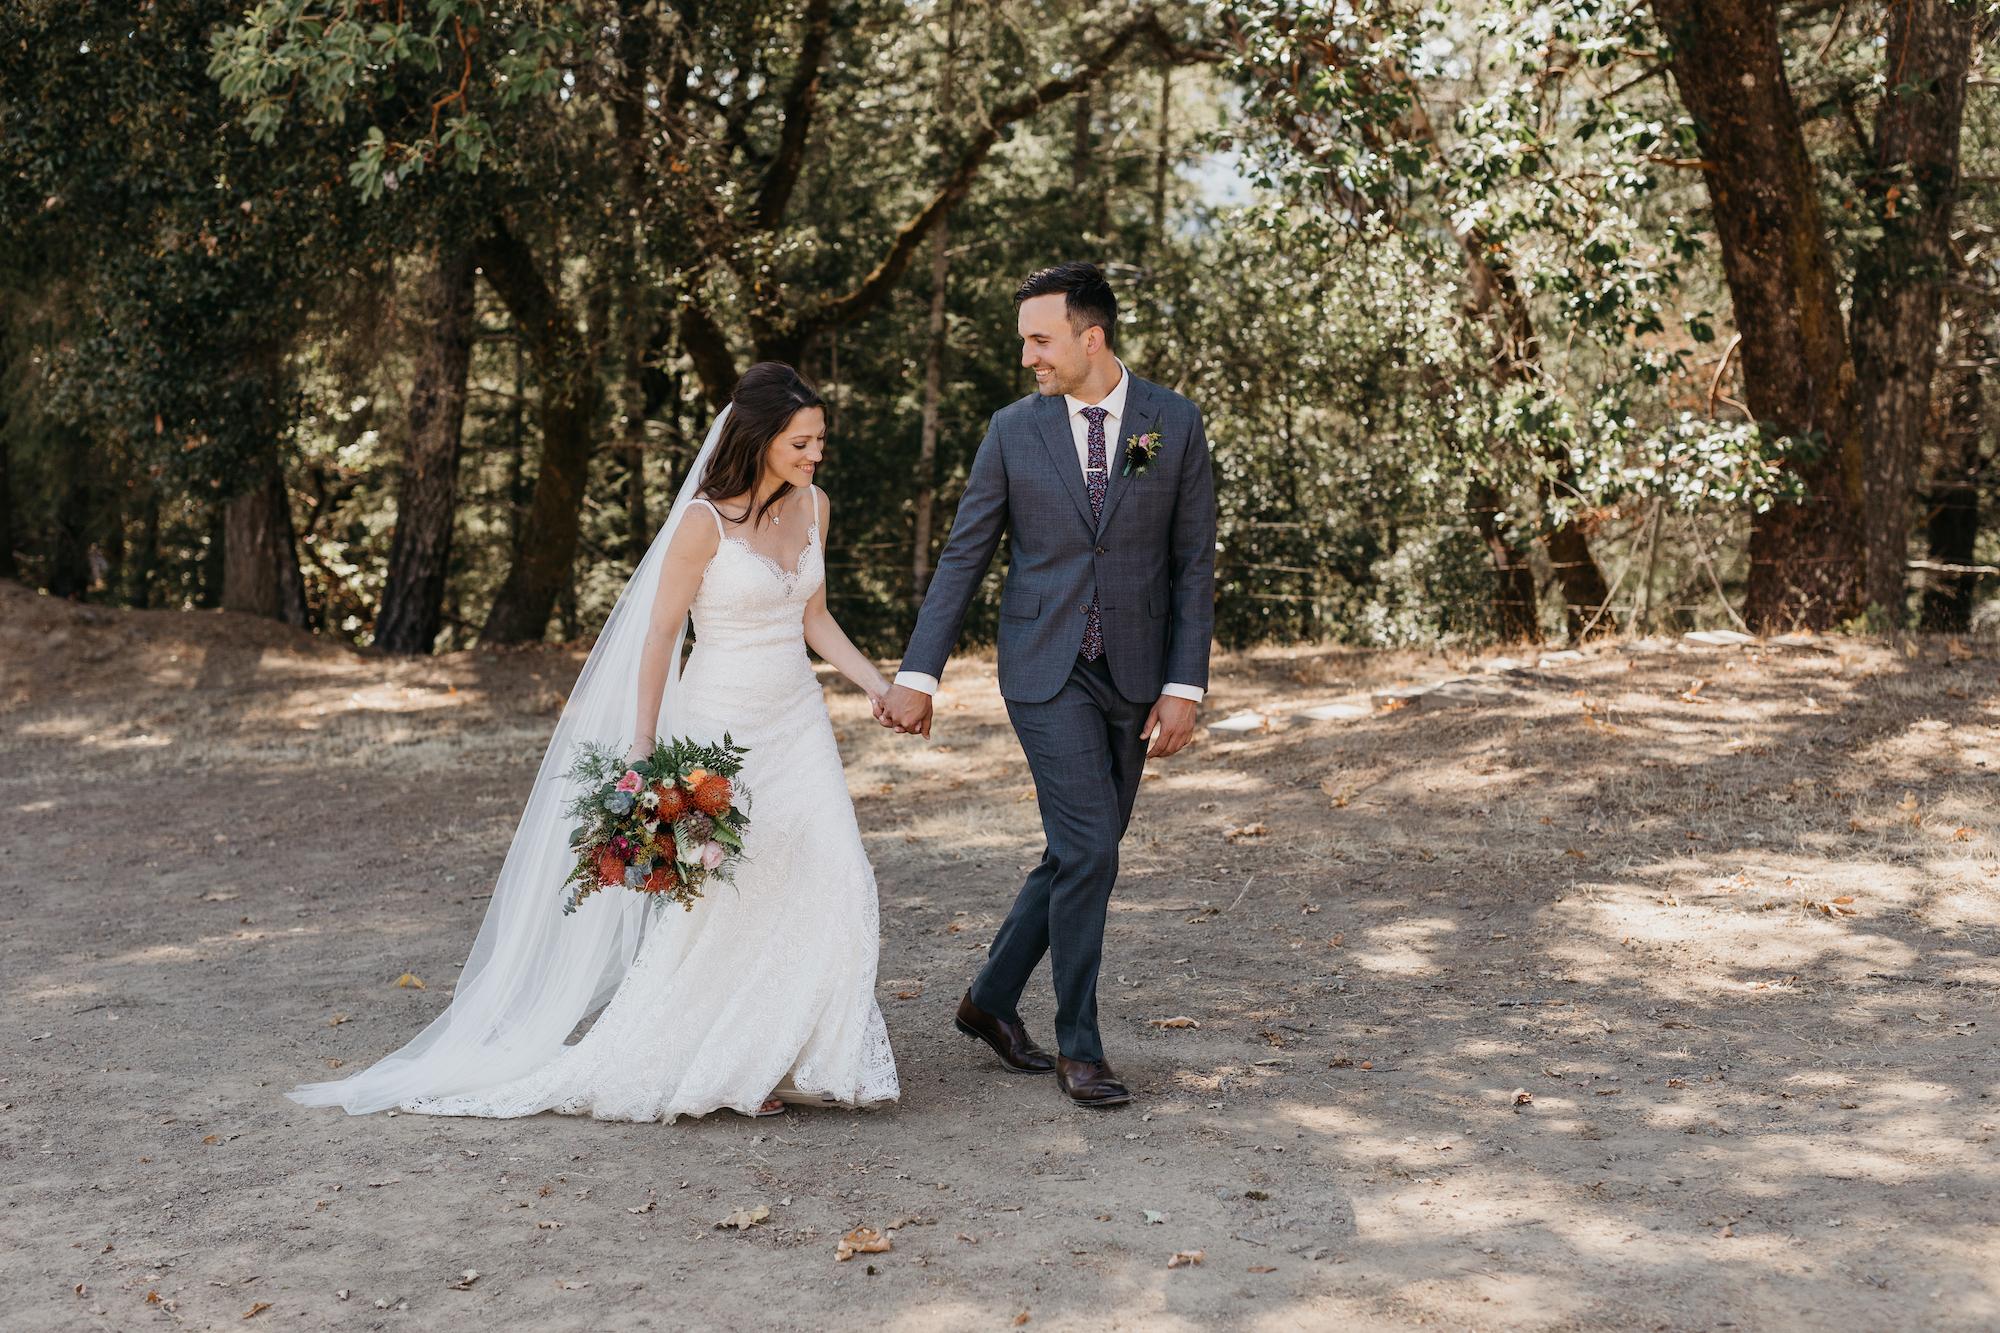 anvil-vineyards-wedding-photographer317.jpg